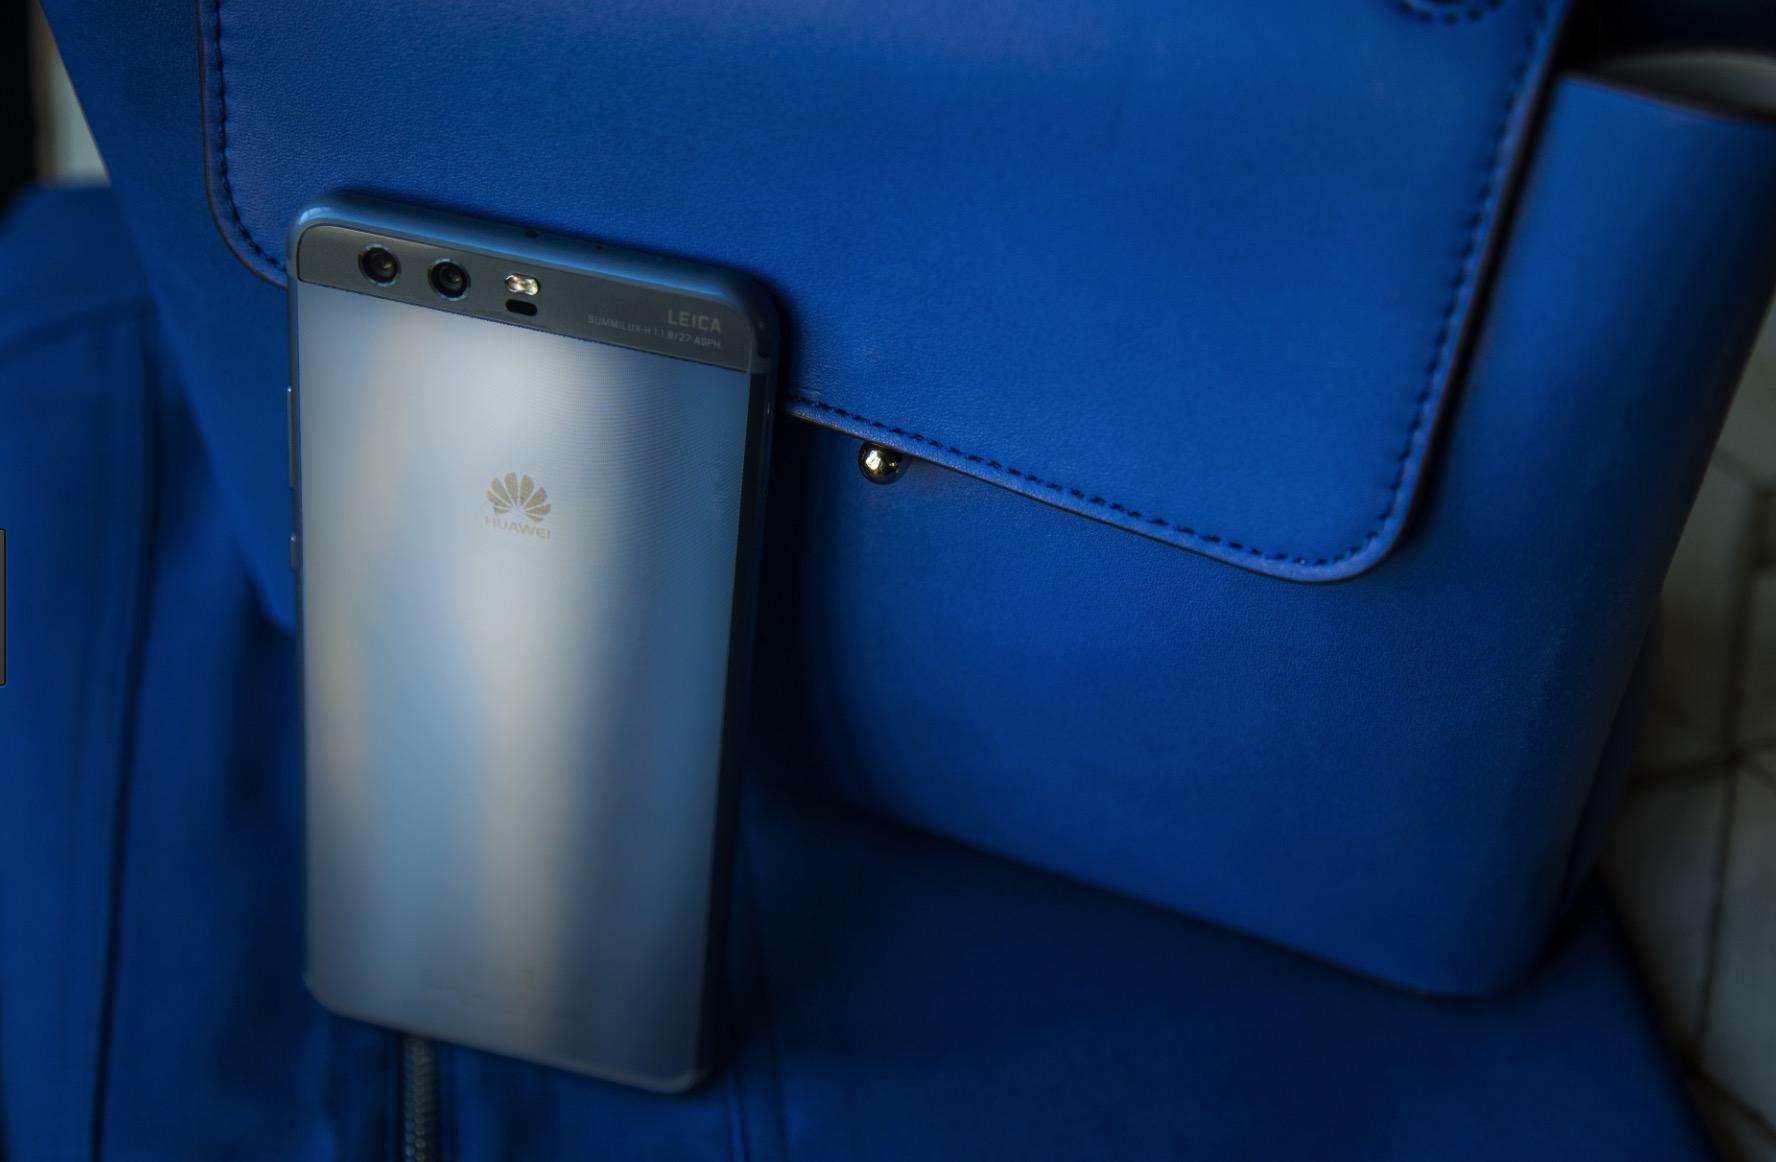 Huawei P10 Plus prezzo